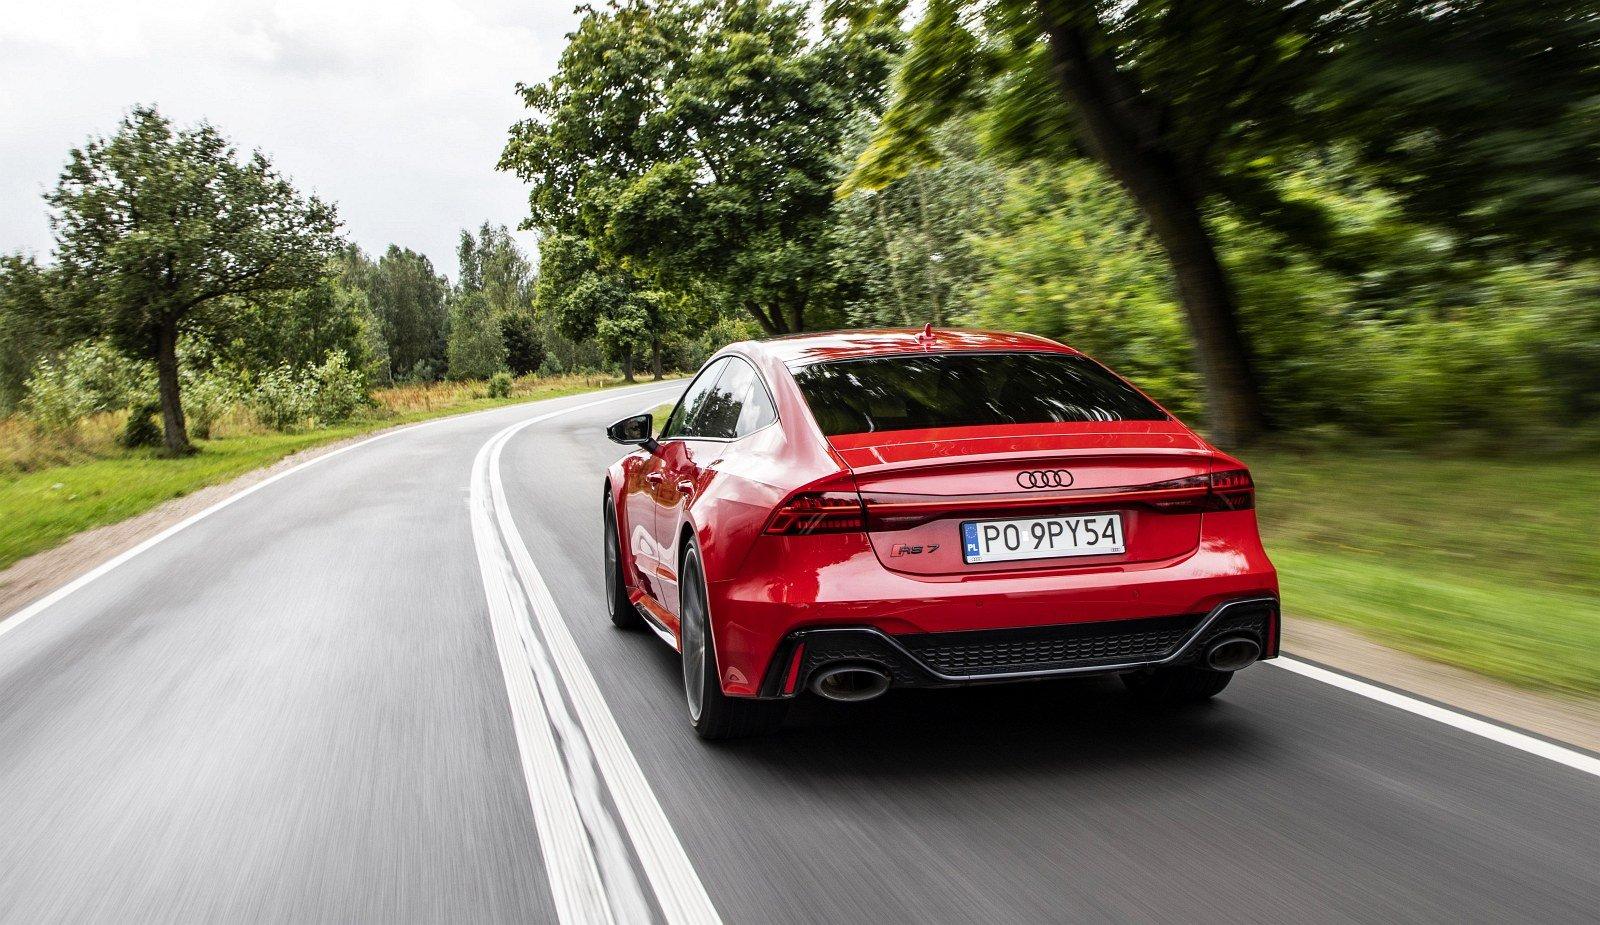 Audi RS 7 Sportback test 2020 tył 01